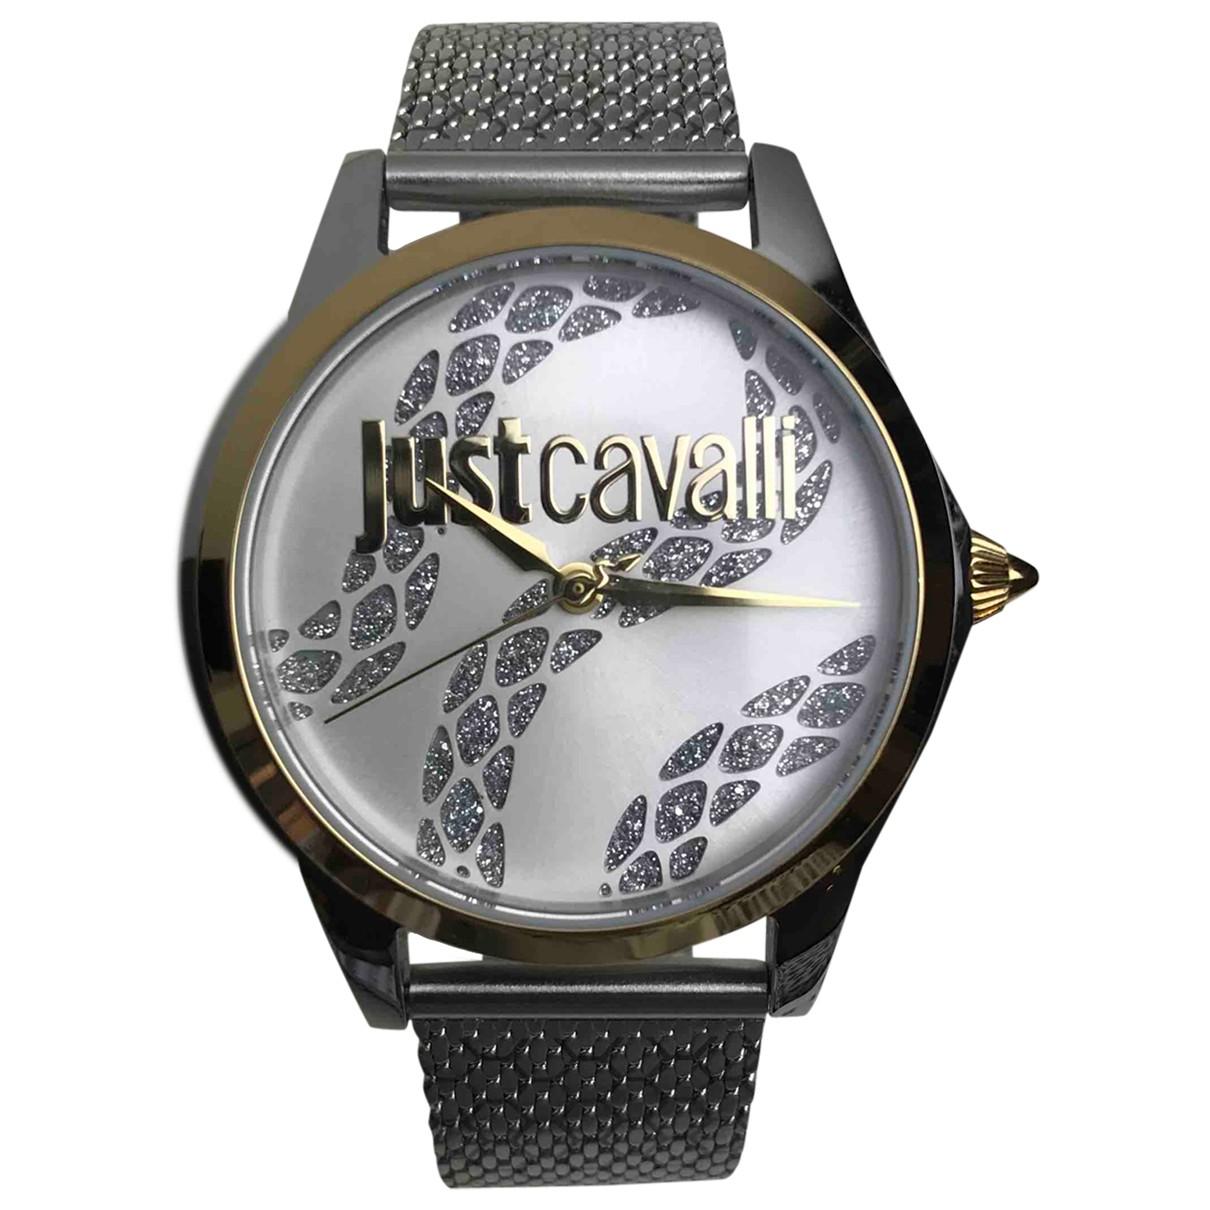 Just Cavalli N Silver Steel watch for Women N